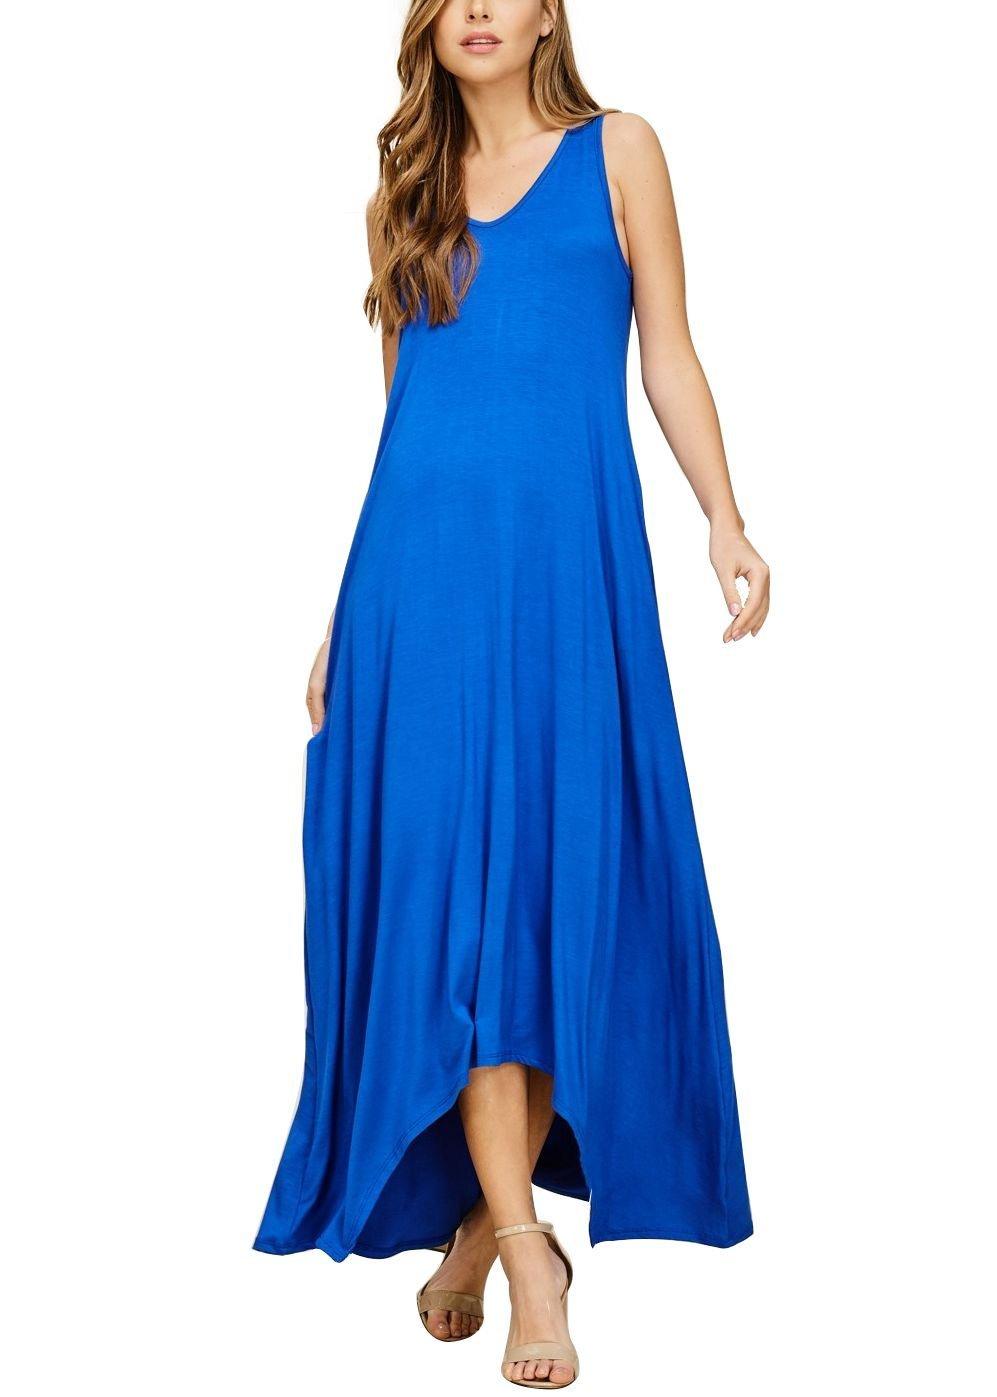 Mari Cias Loose Maxi Dress with Pockets (Royal Blue, X-Large)